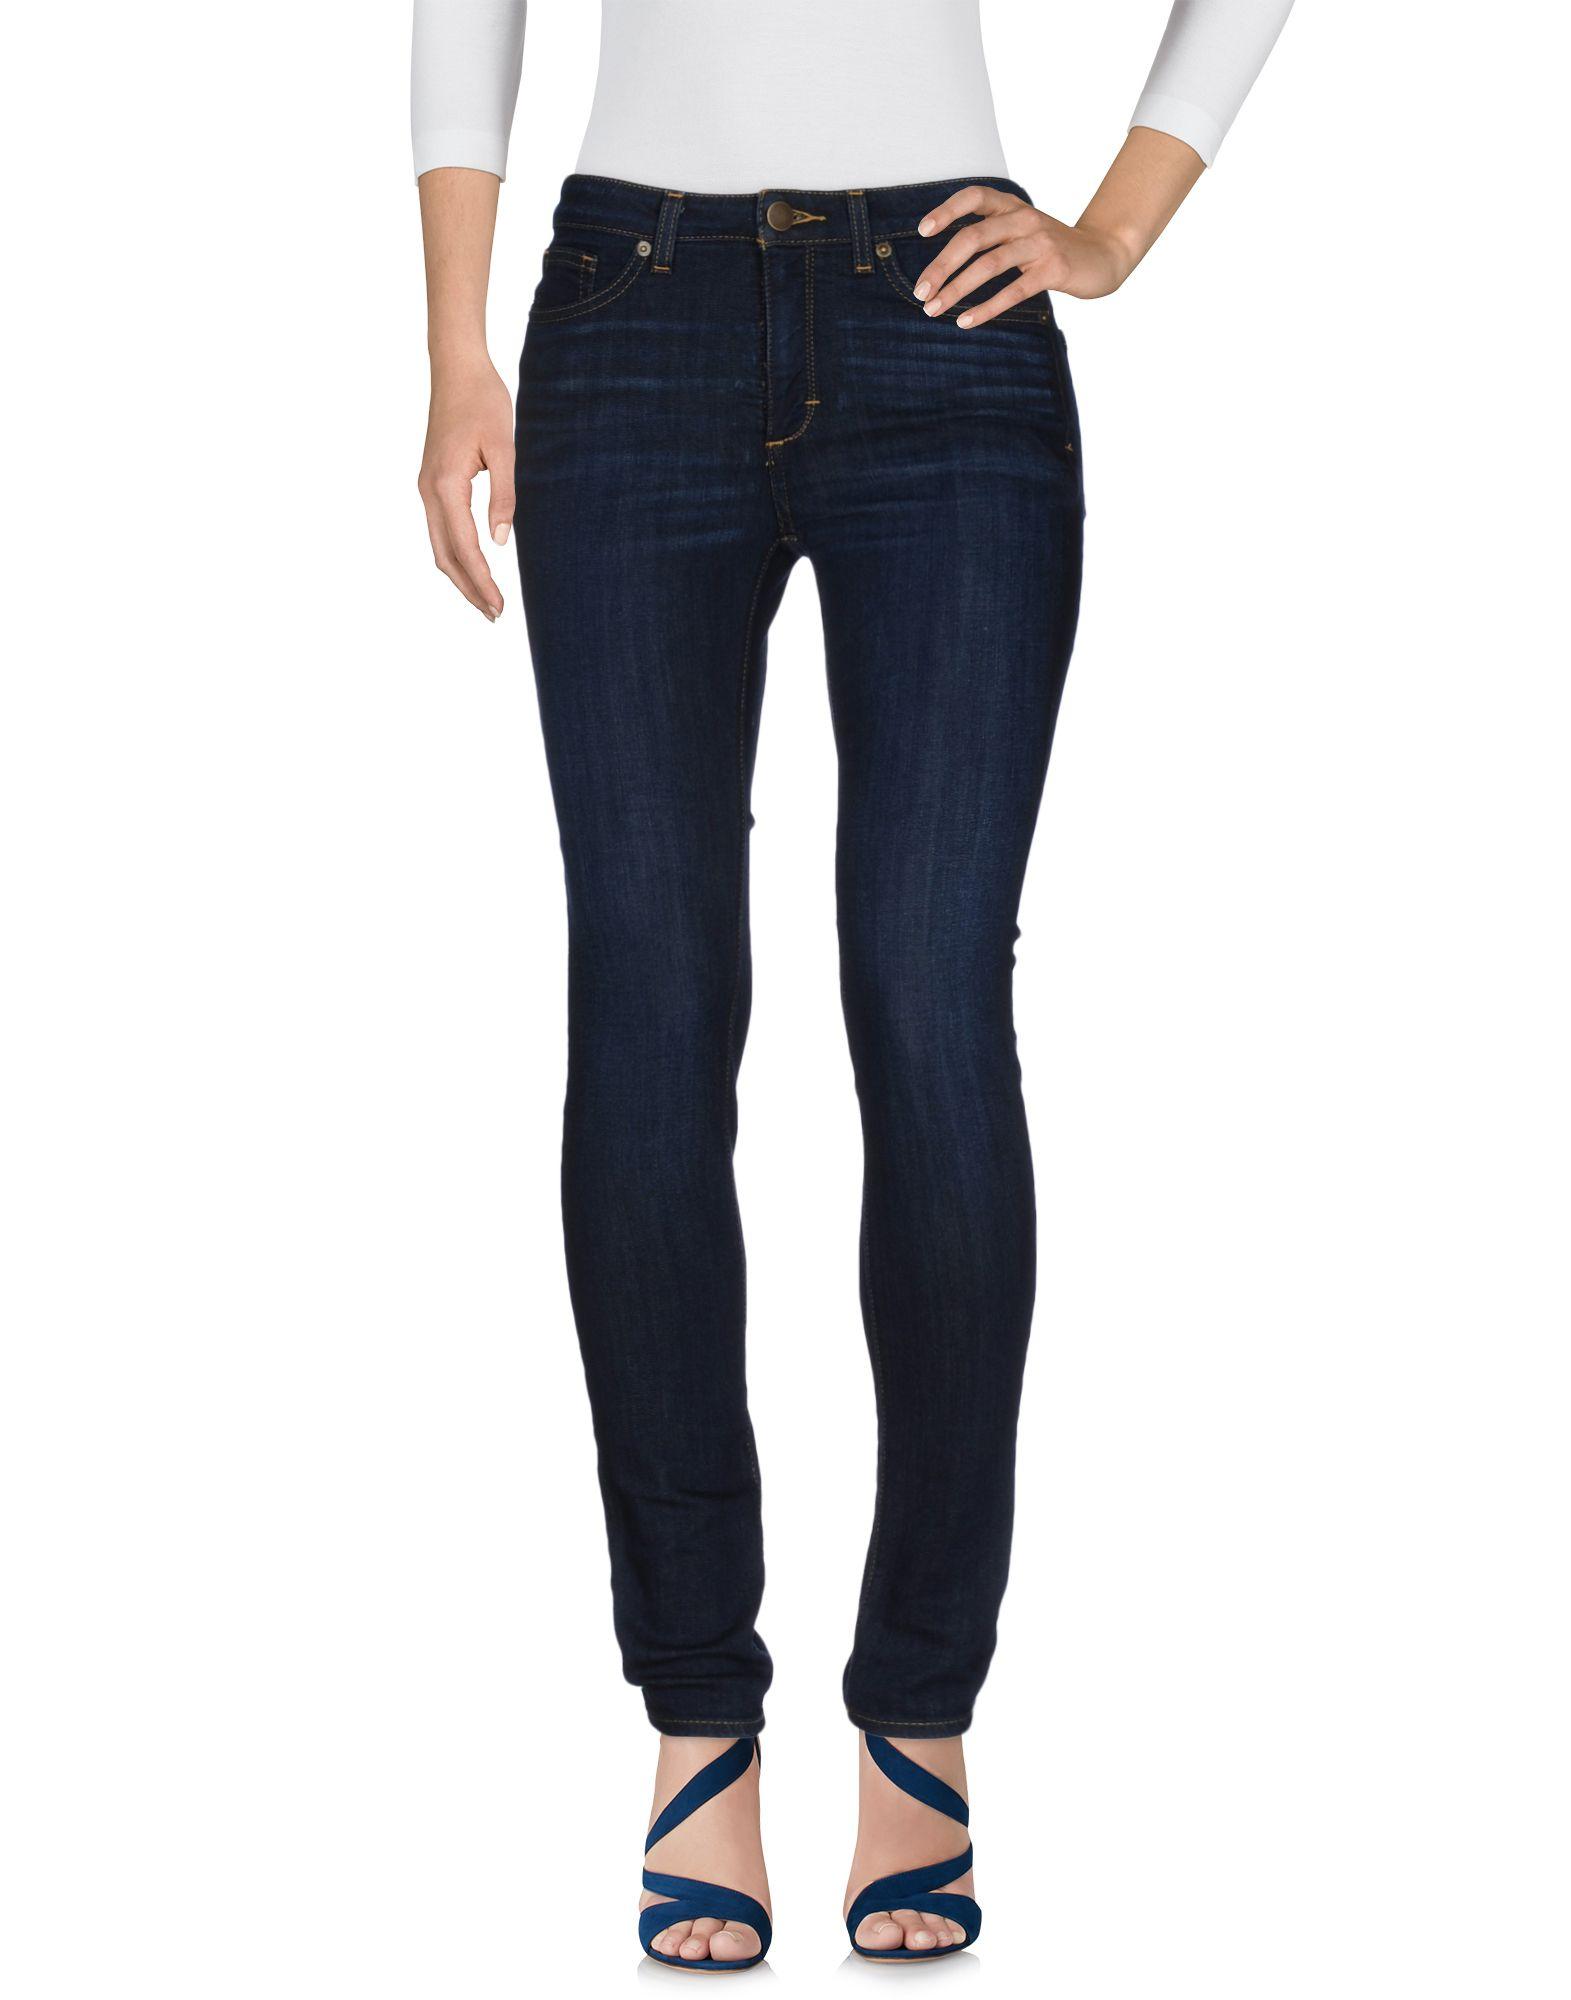 SPANX Джинсовые брюки carver pioneer camp джинсовые брюки мужские обычные джинсовые брюки темно синий 33 611 021